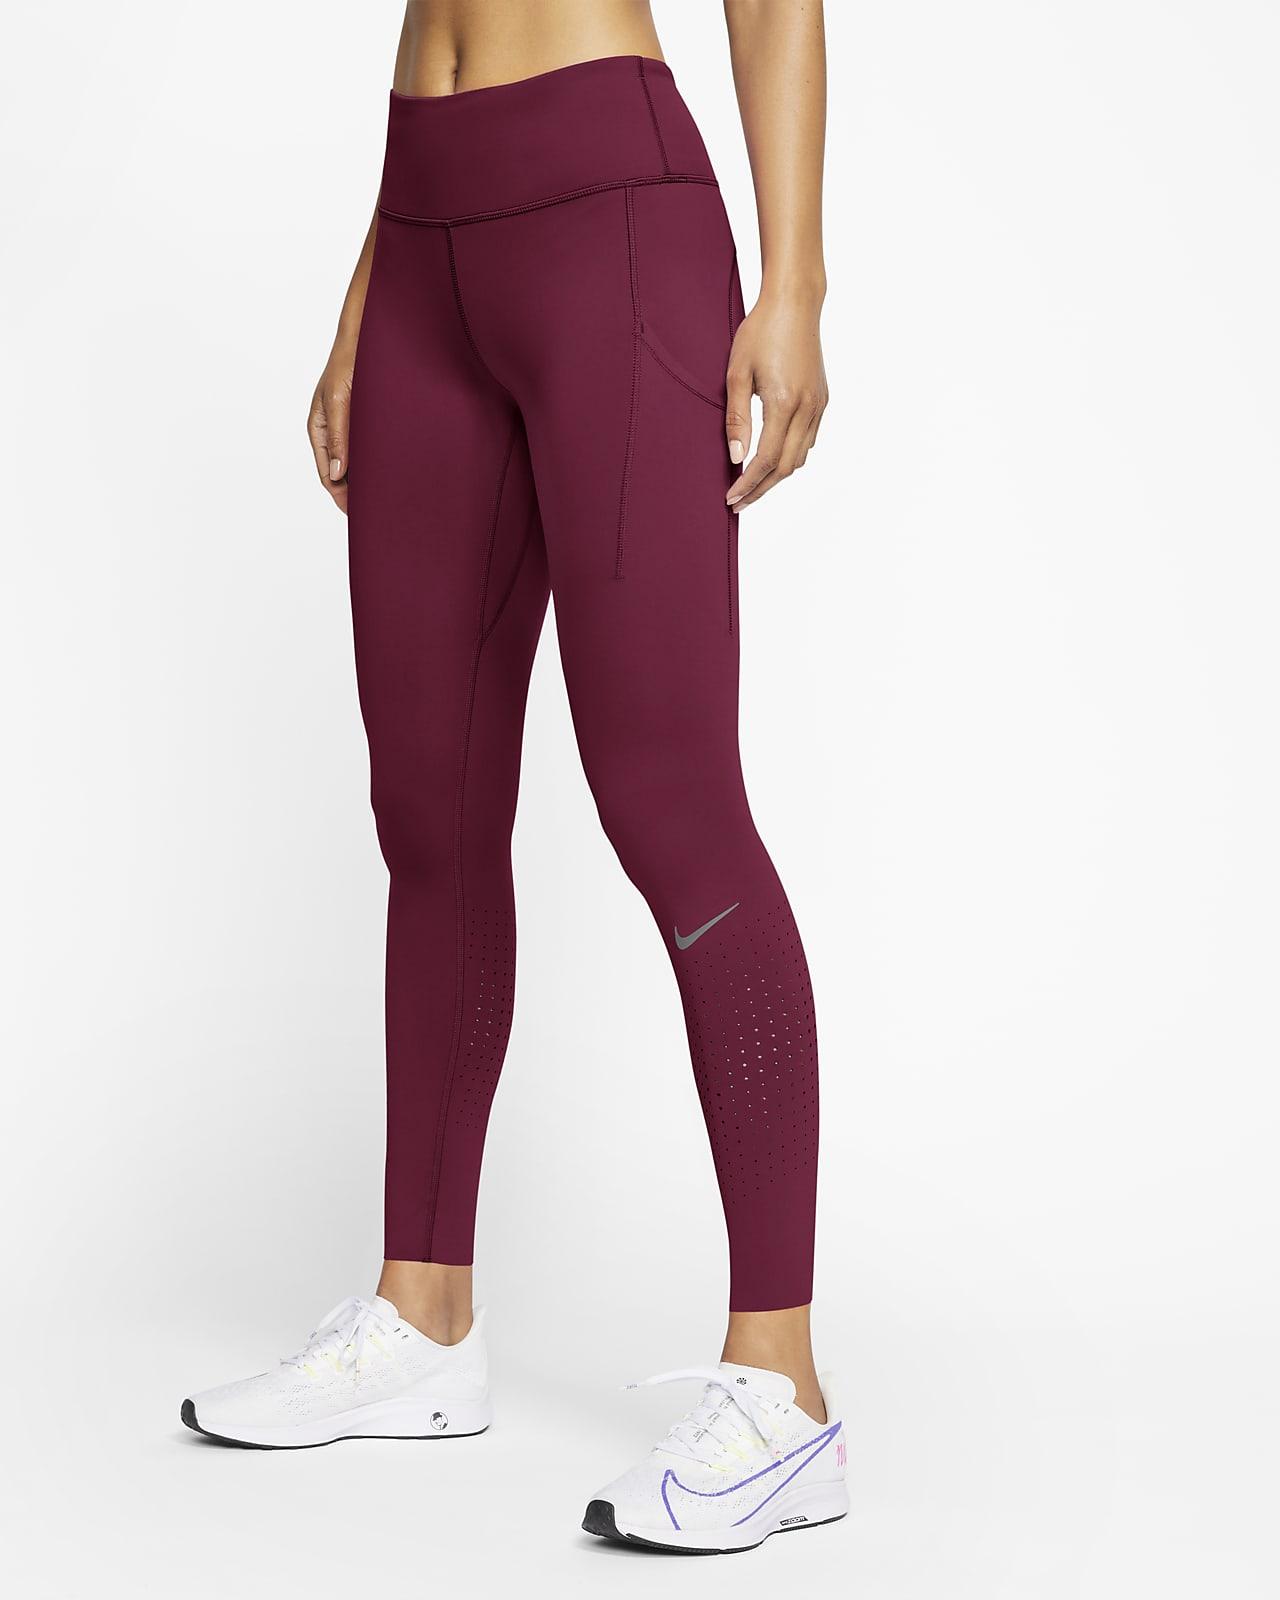 Женские беговые леггинсы Nike Epic Luxe